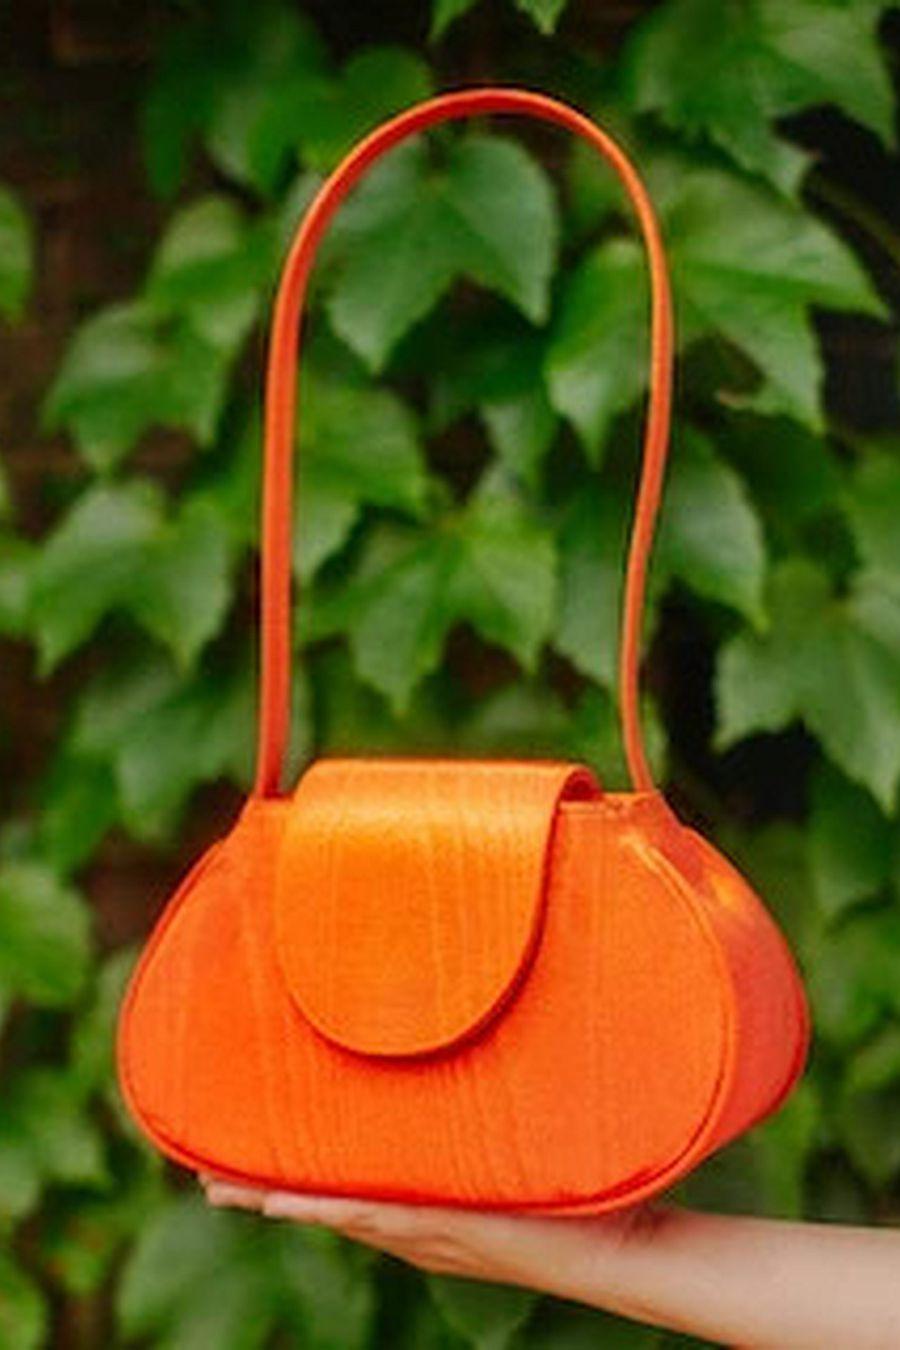 For The Ages New York Ineva Baguette - Sun Copper Orange